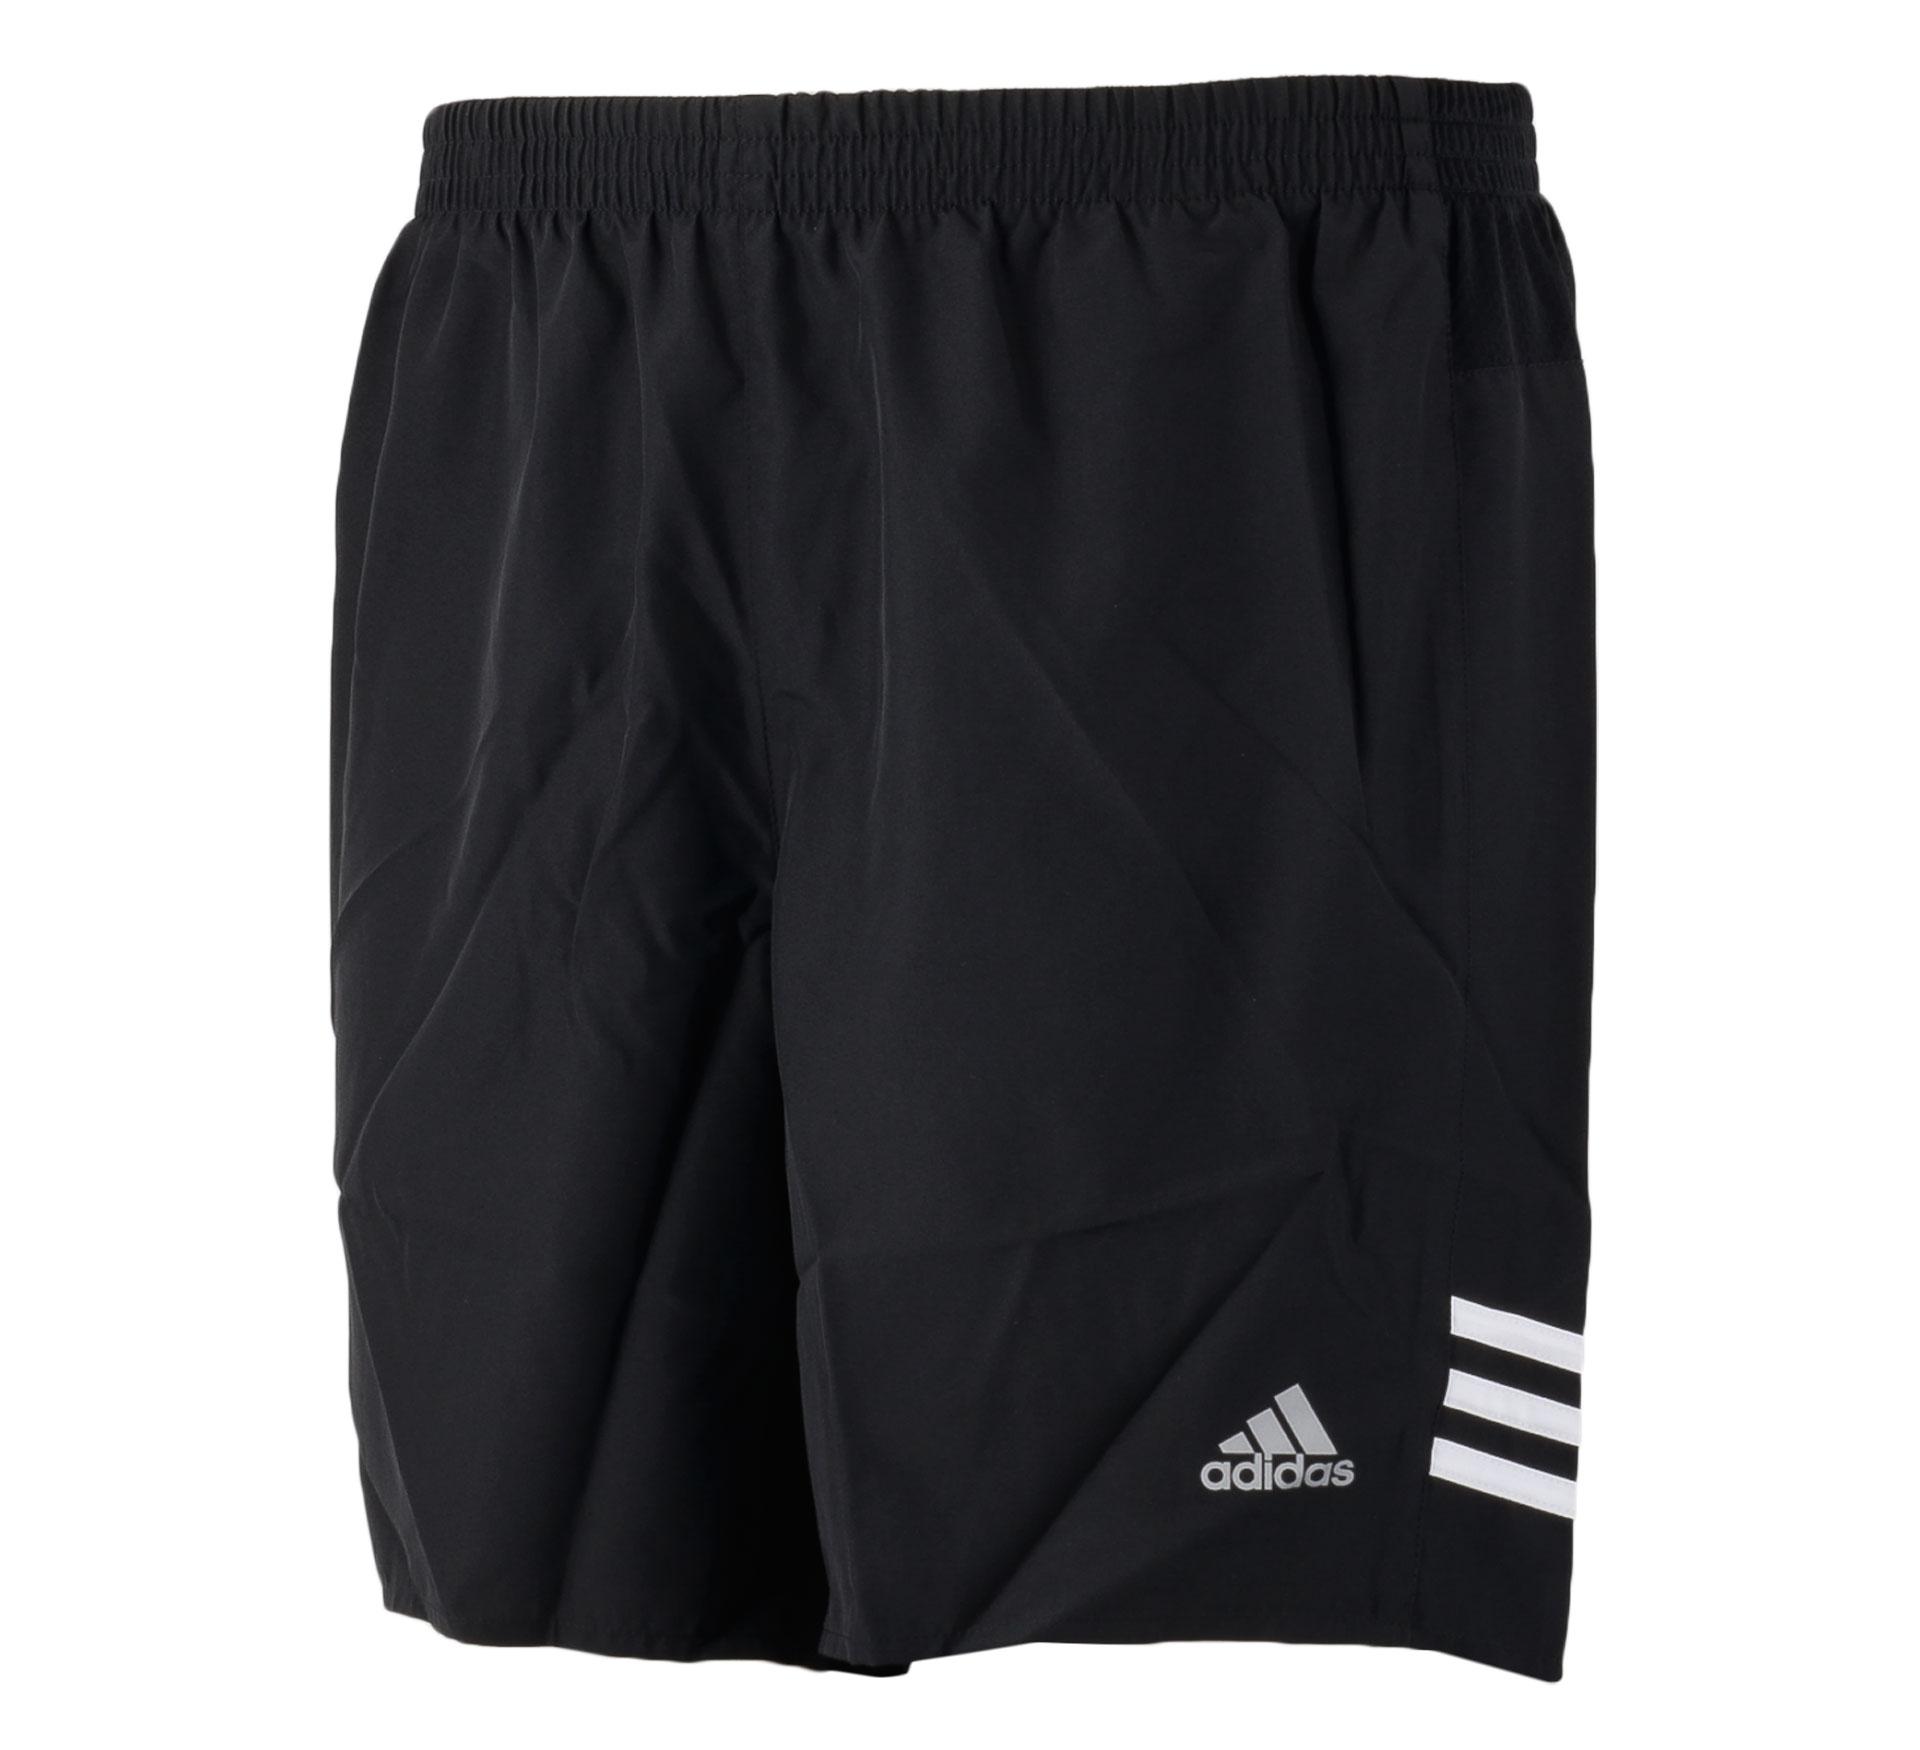 Adidas RS 7inch Sho M zwart - wit